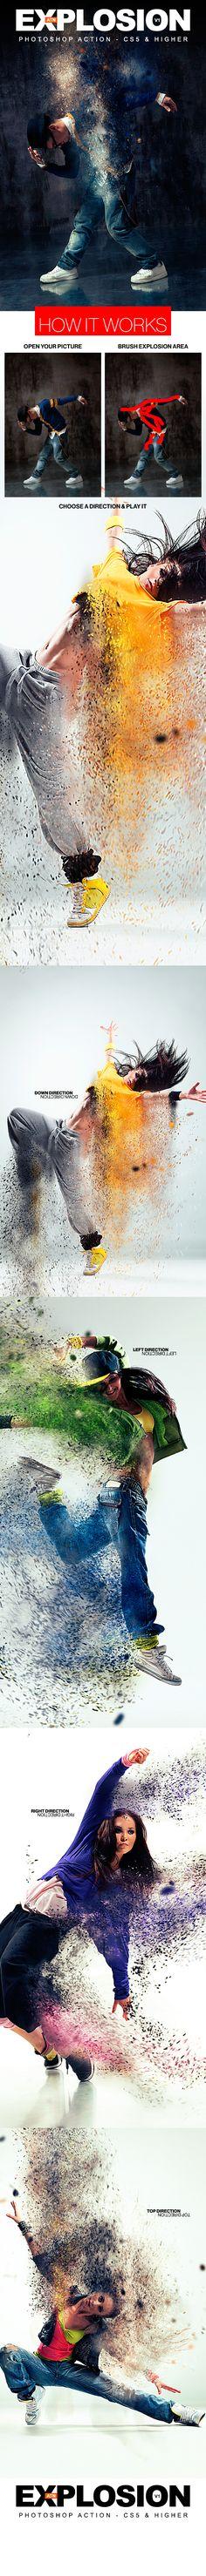 Explosion Photoshop Action